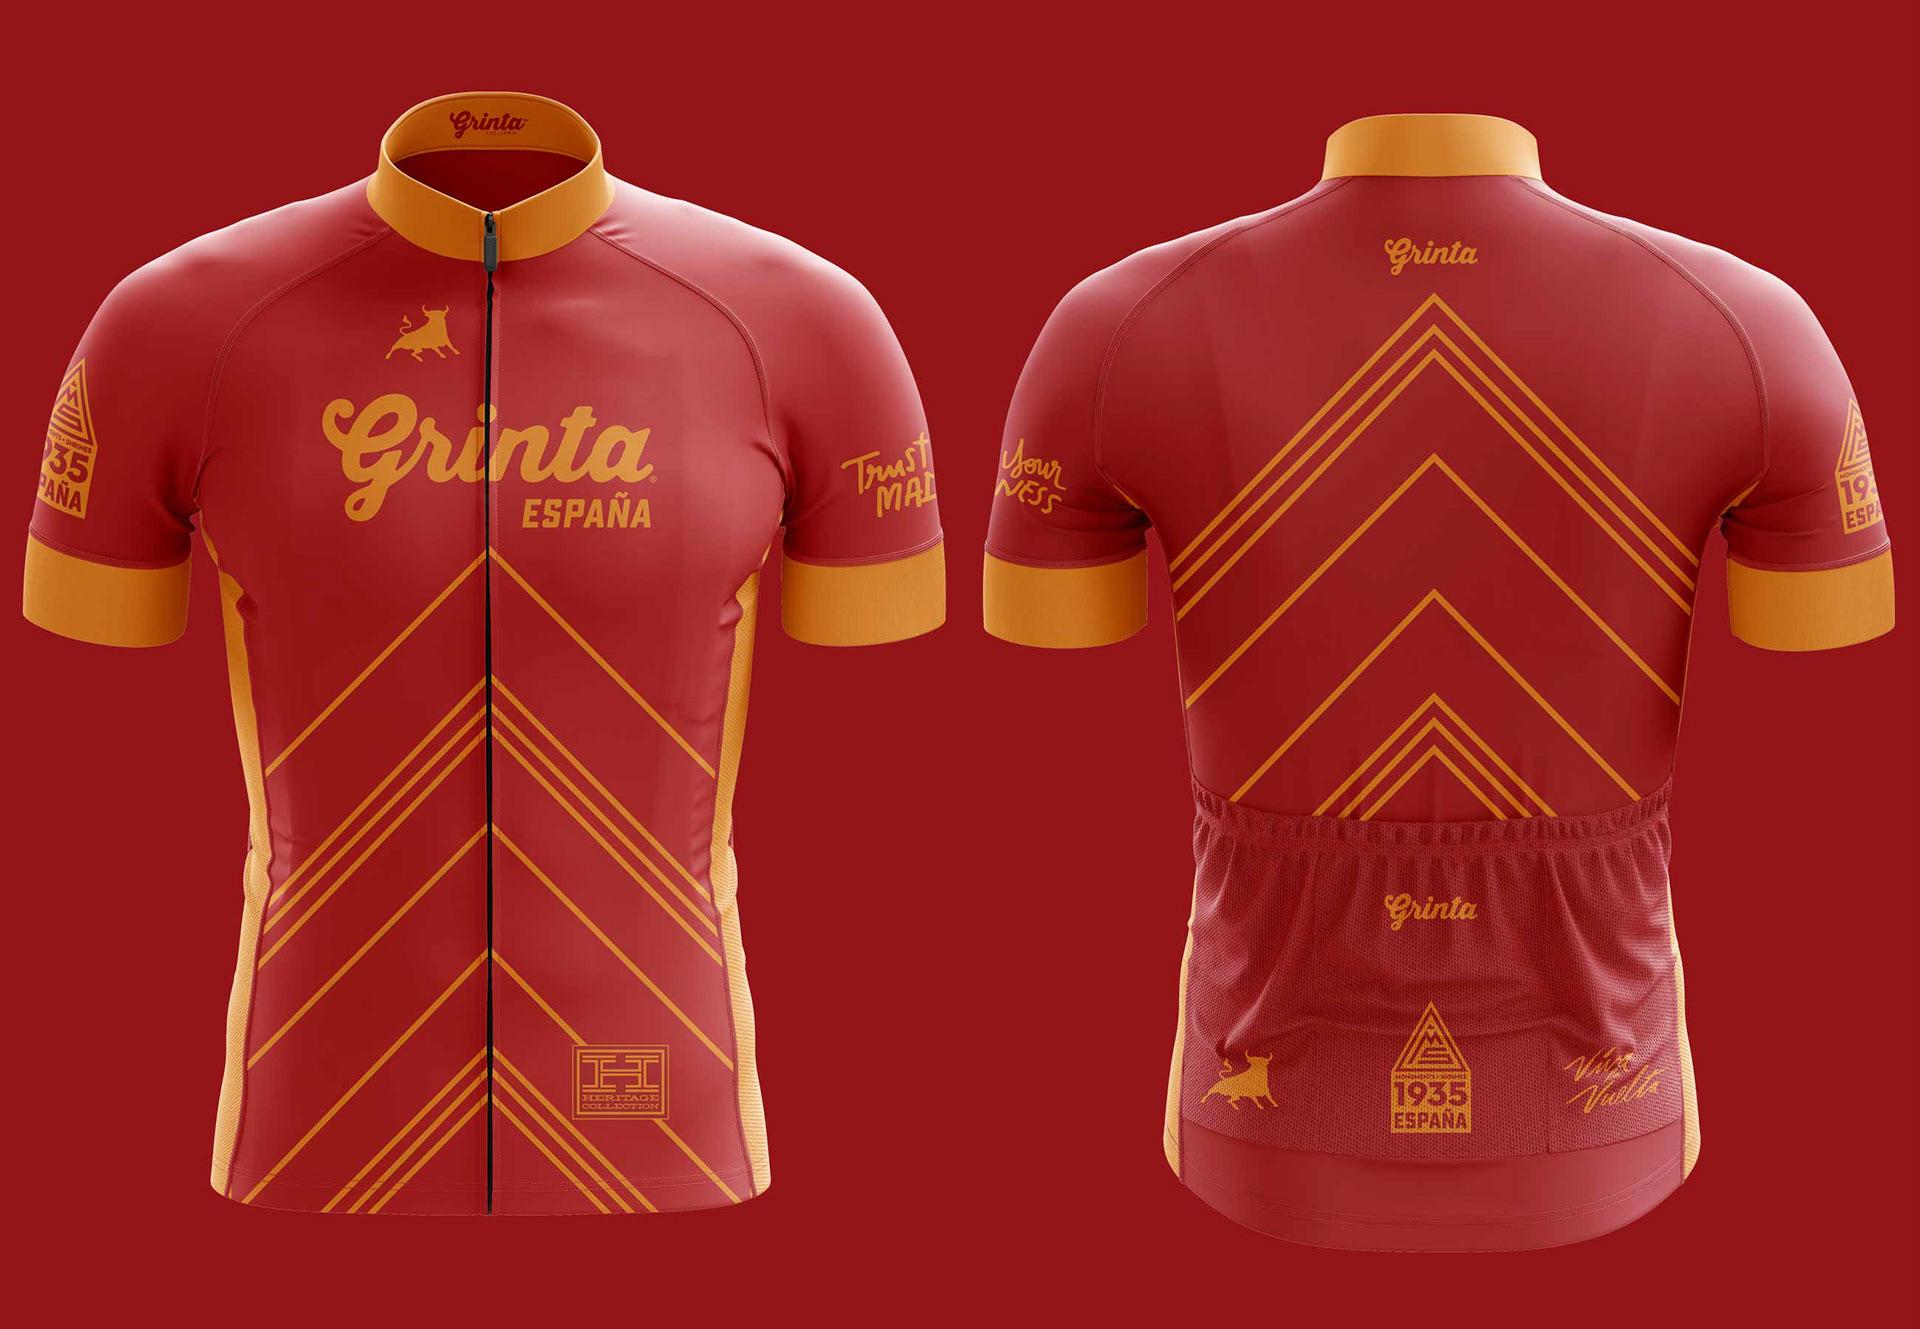 grinta-jerseys-red-spain-vuelta.jpg